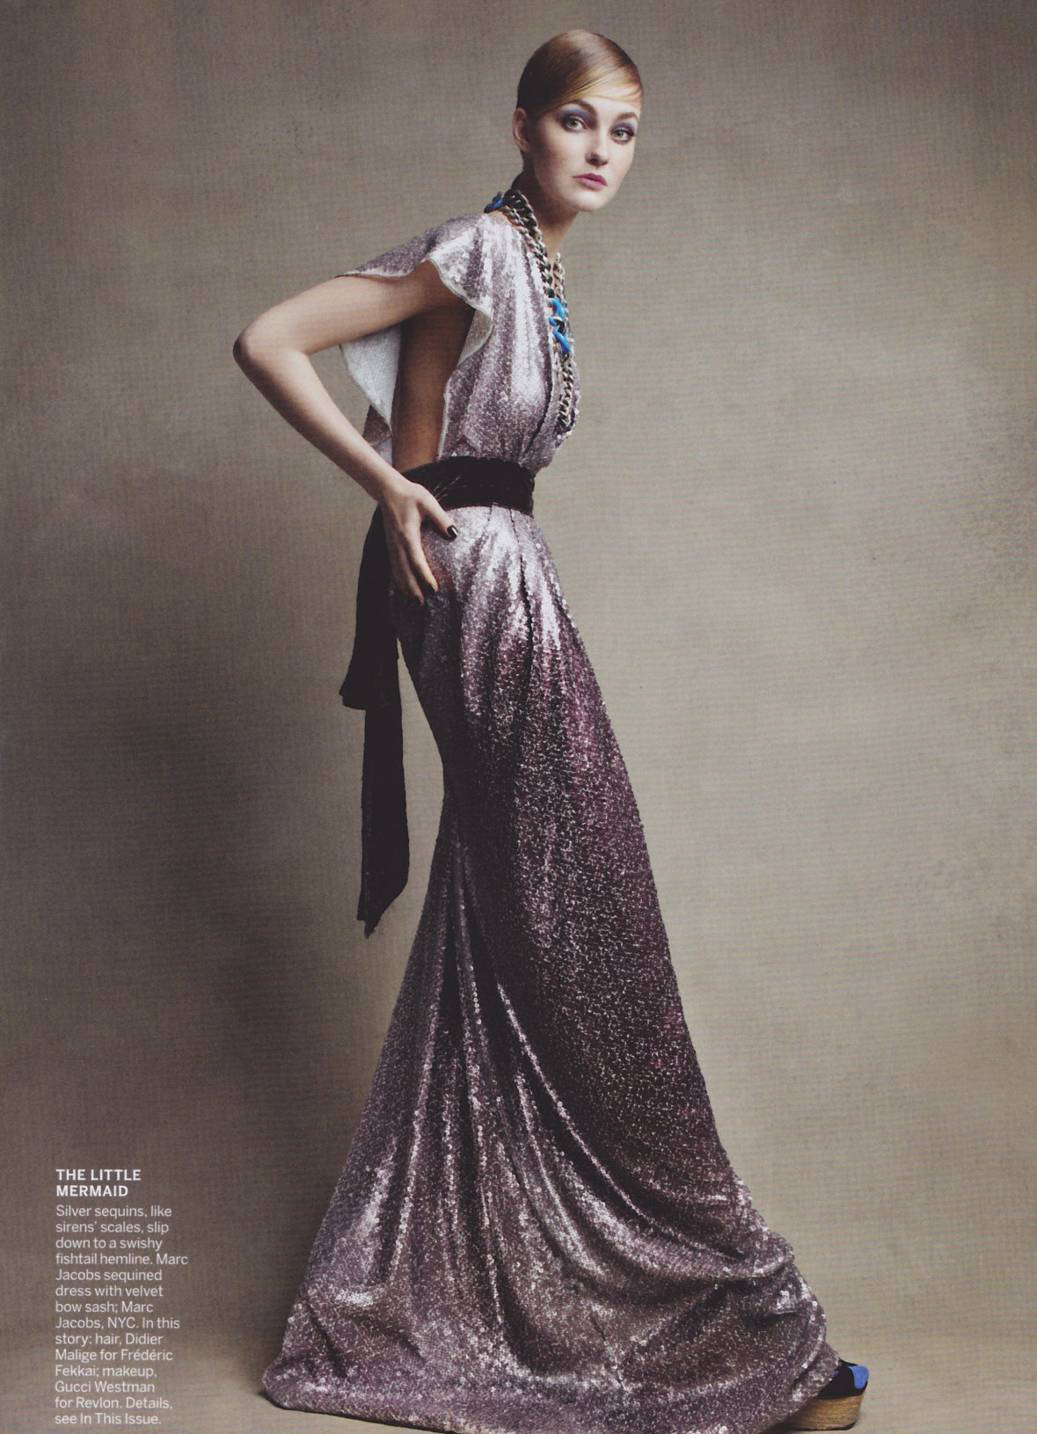 models Caroline Trentini